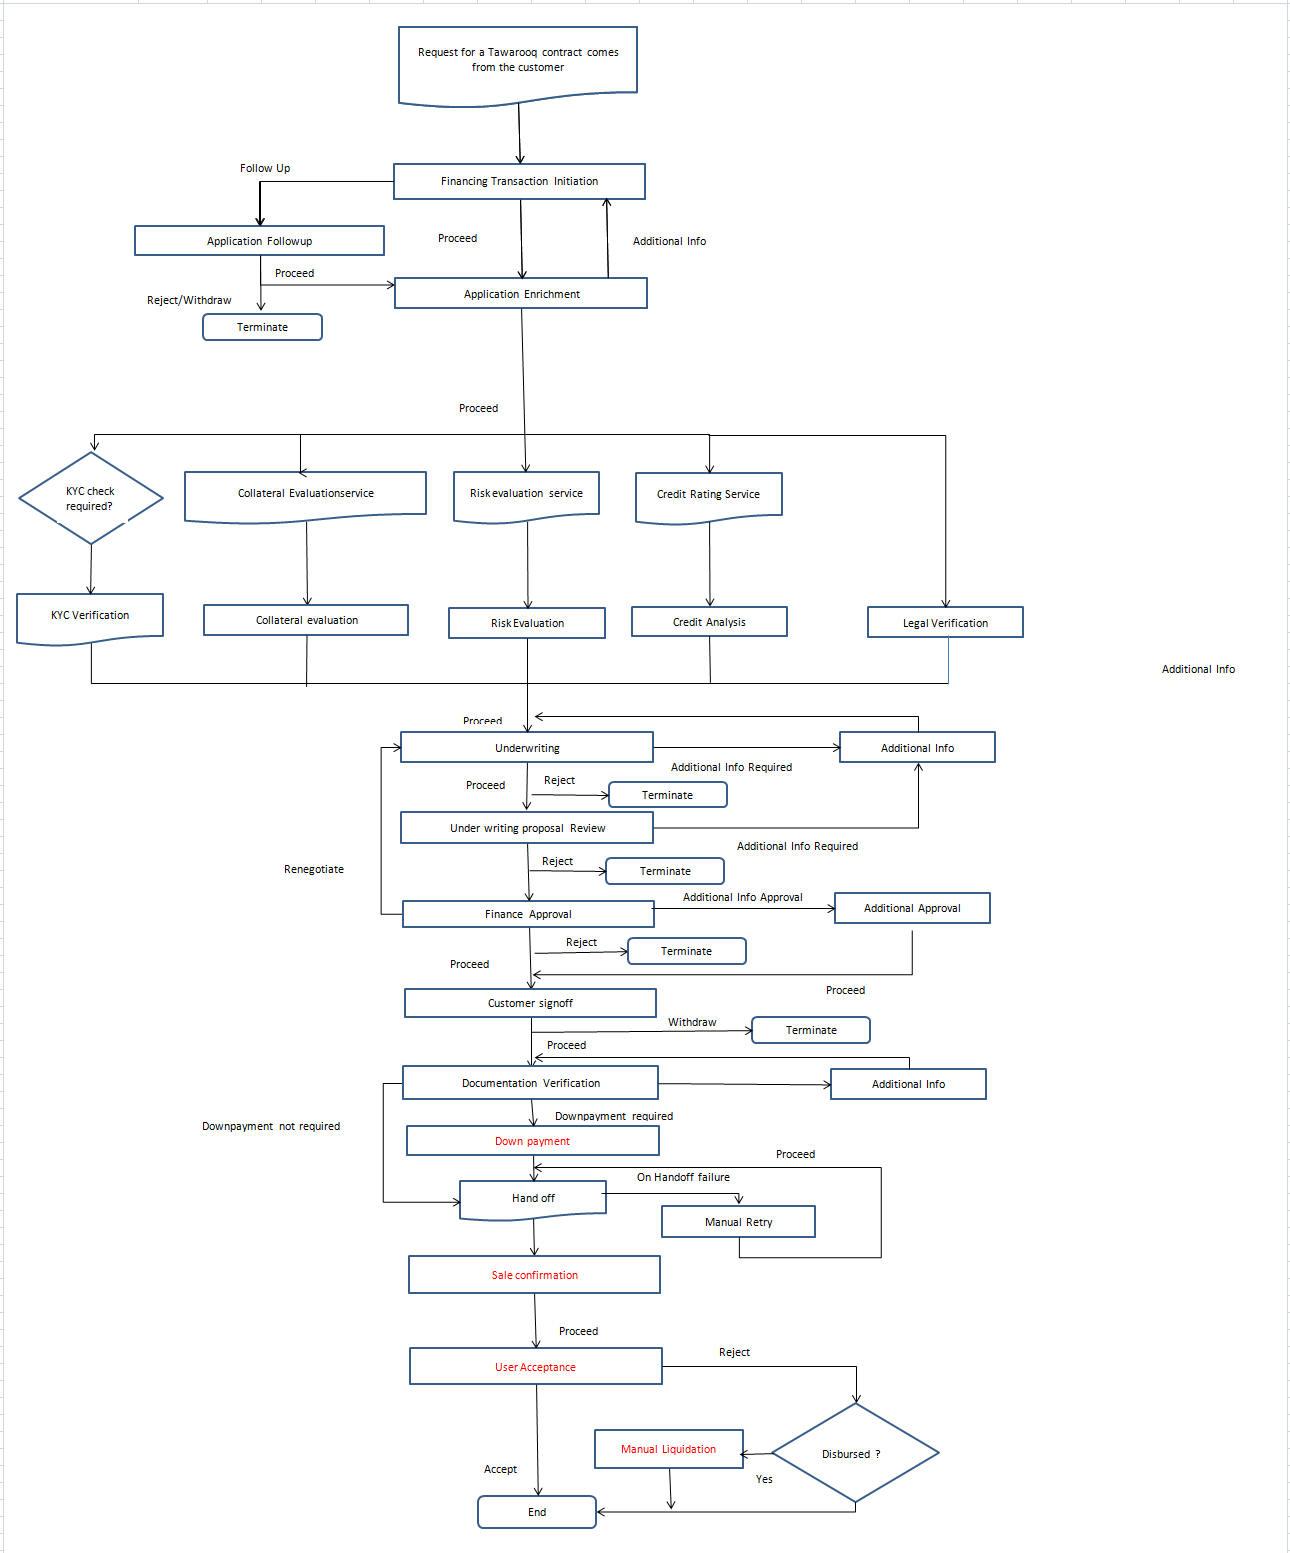 recruiting process flow chart conversation different types of dvi bpmn process flow diagram recruiting process flow - Bpmn Chart